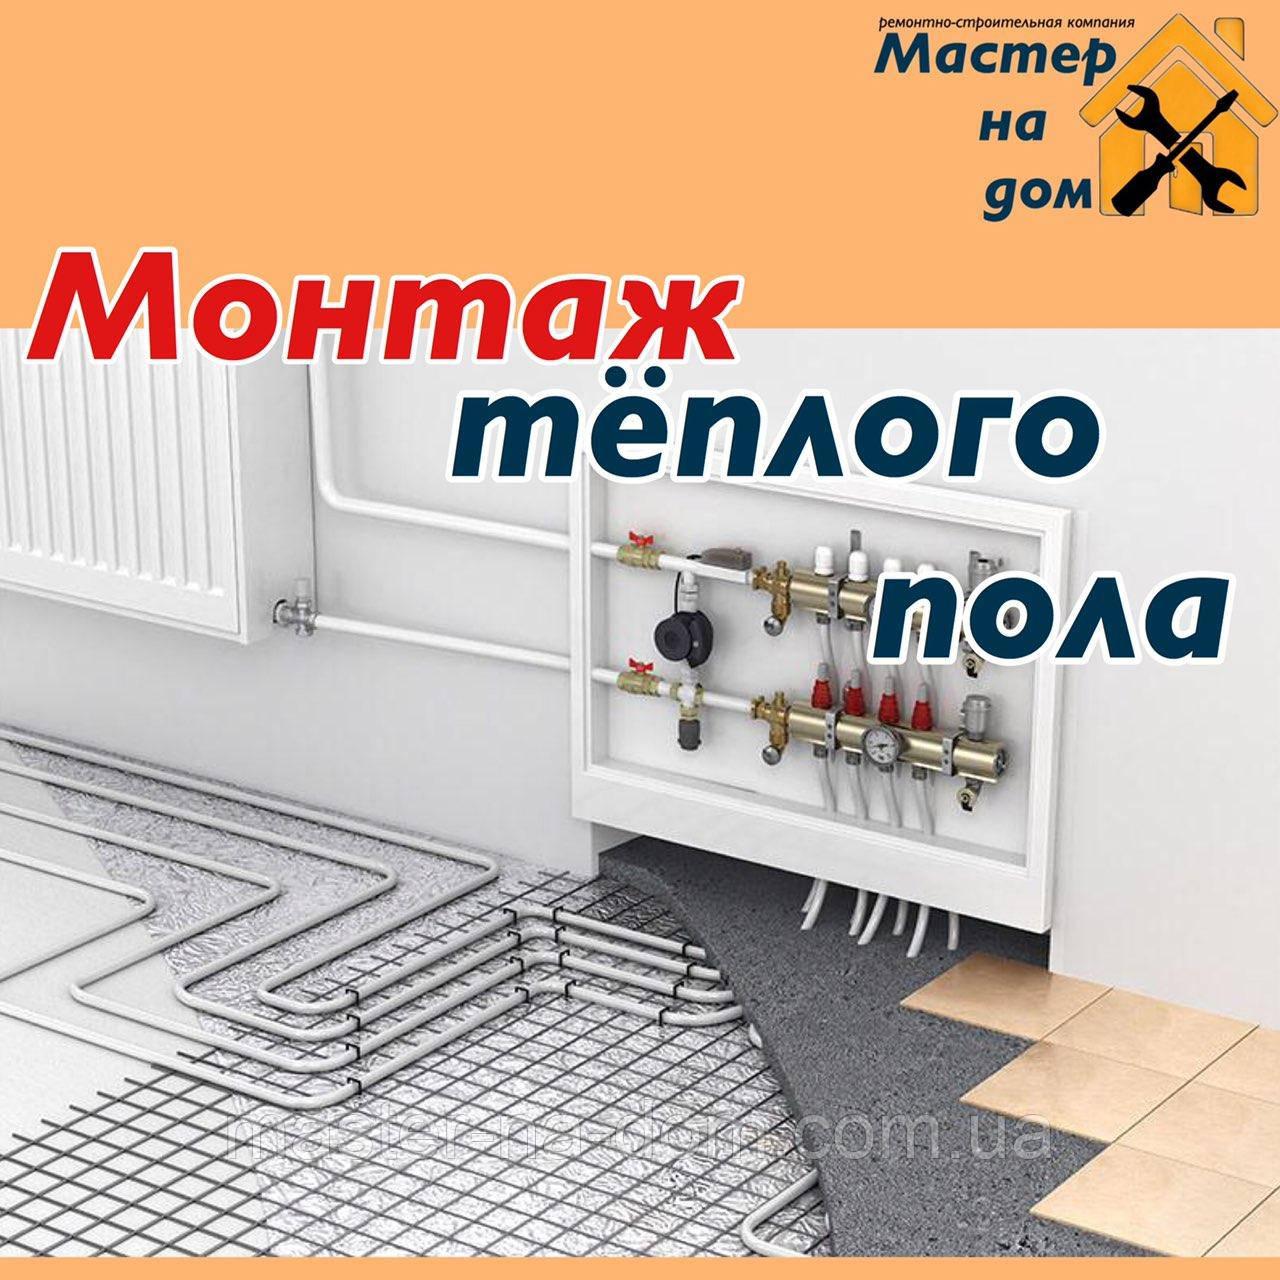 Монтаж теплого пола в Днепре